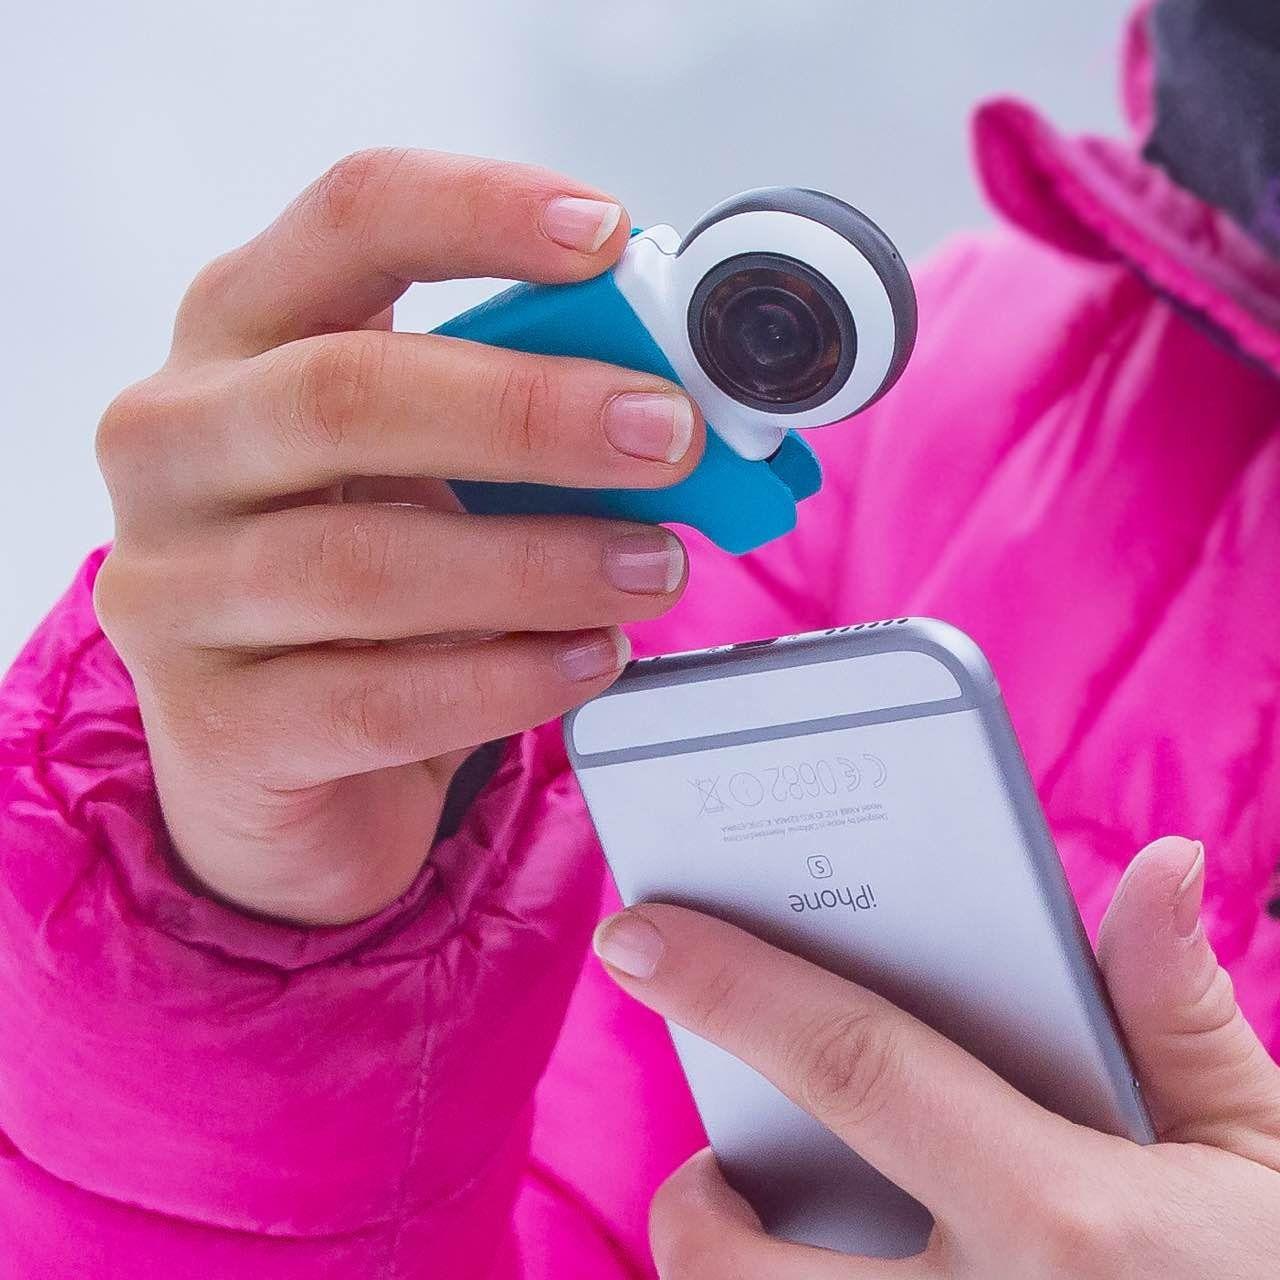 Giroptic iO 360Degree Camera Ios app, Apple watch, Apps